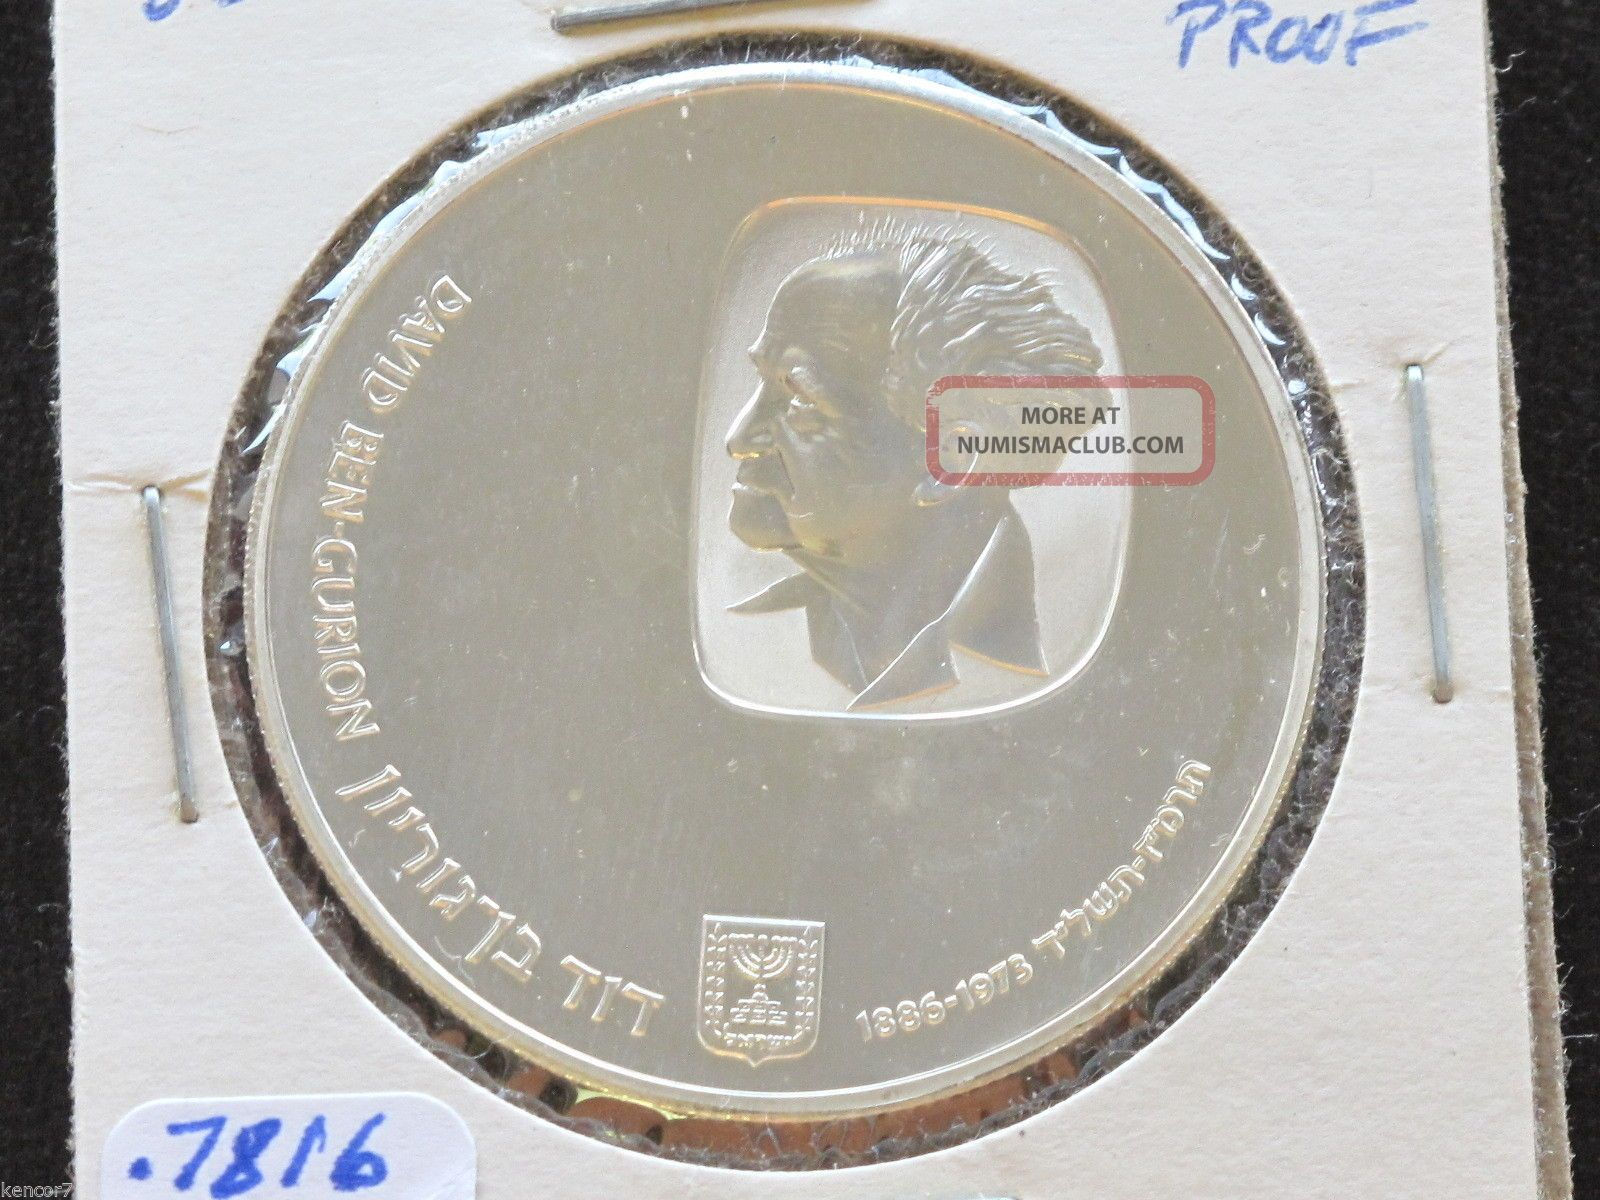 David Ben Gurion Israel 25 Lirot 1974,SILVER COIN